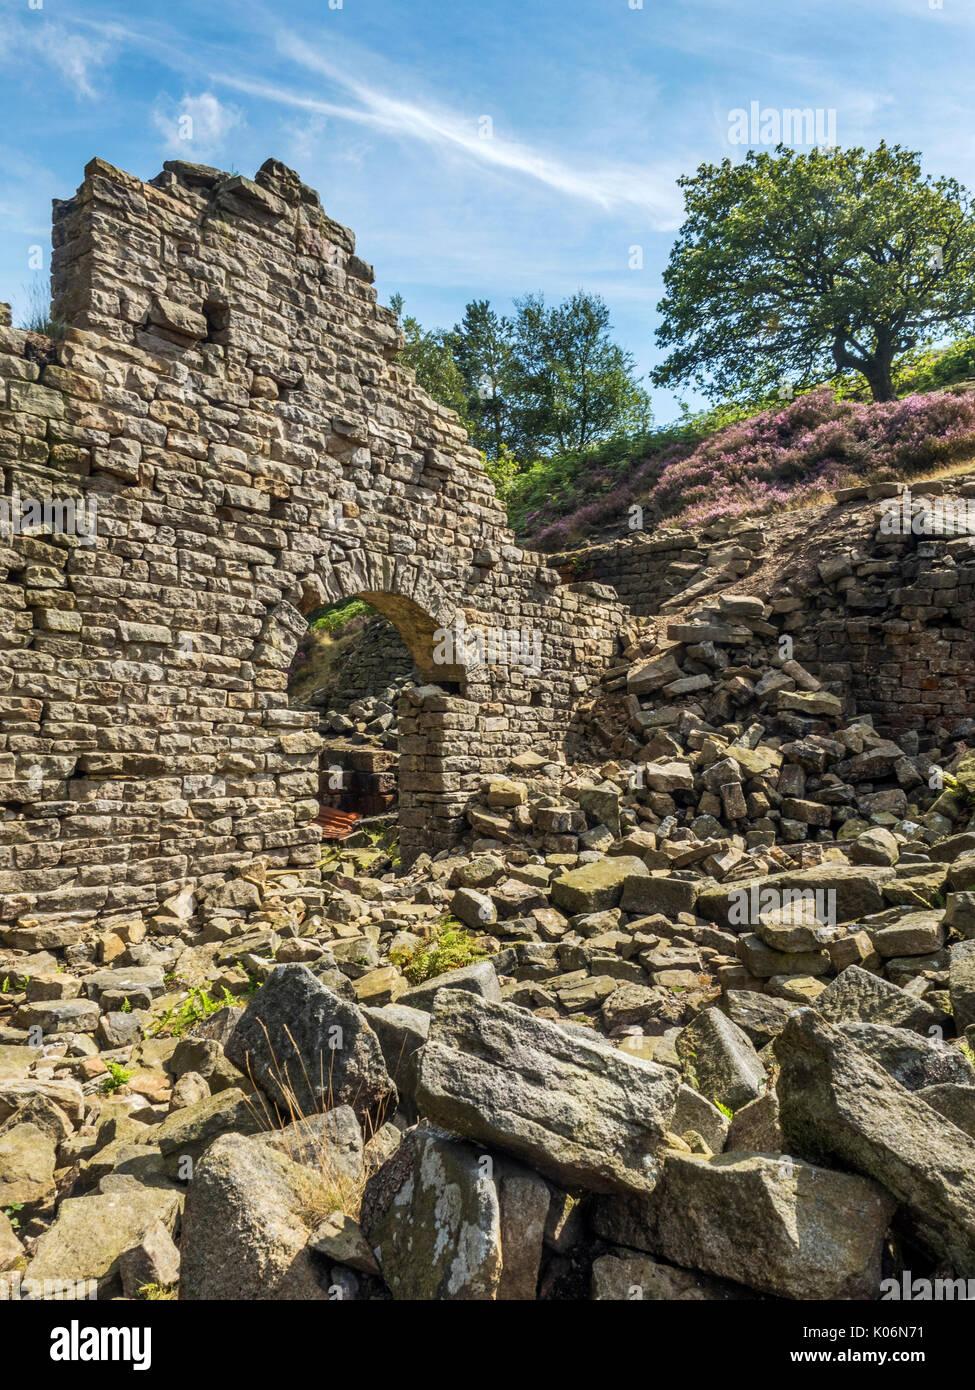 Ruin of Prosperous Lead Smelting Mill near Greenhow Pateley Bridge Nidderdale AONB Yorkshire England - Stock Image